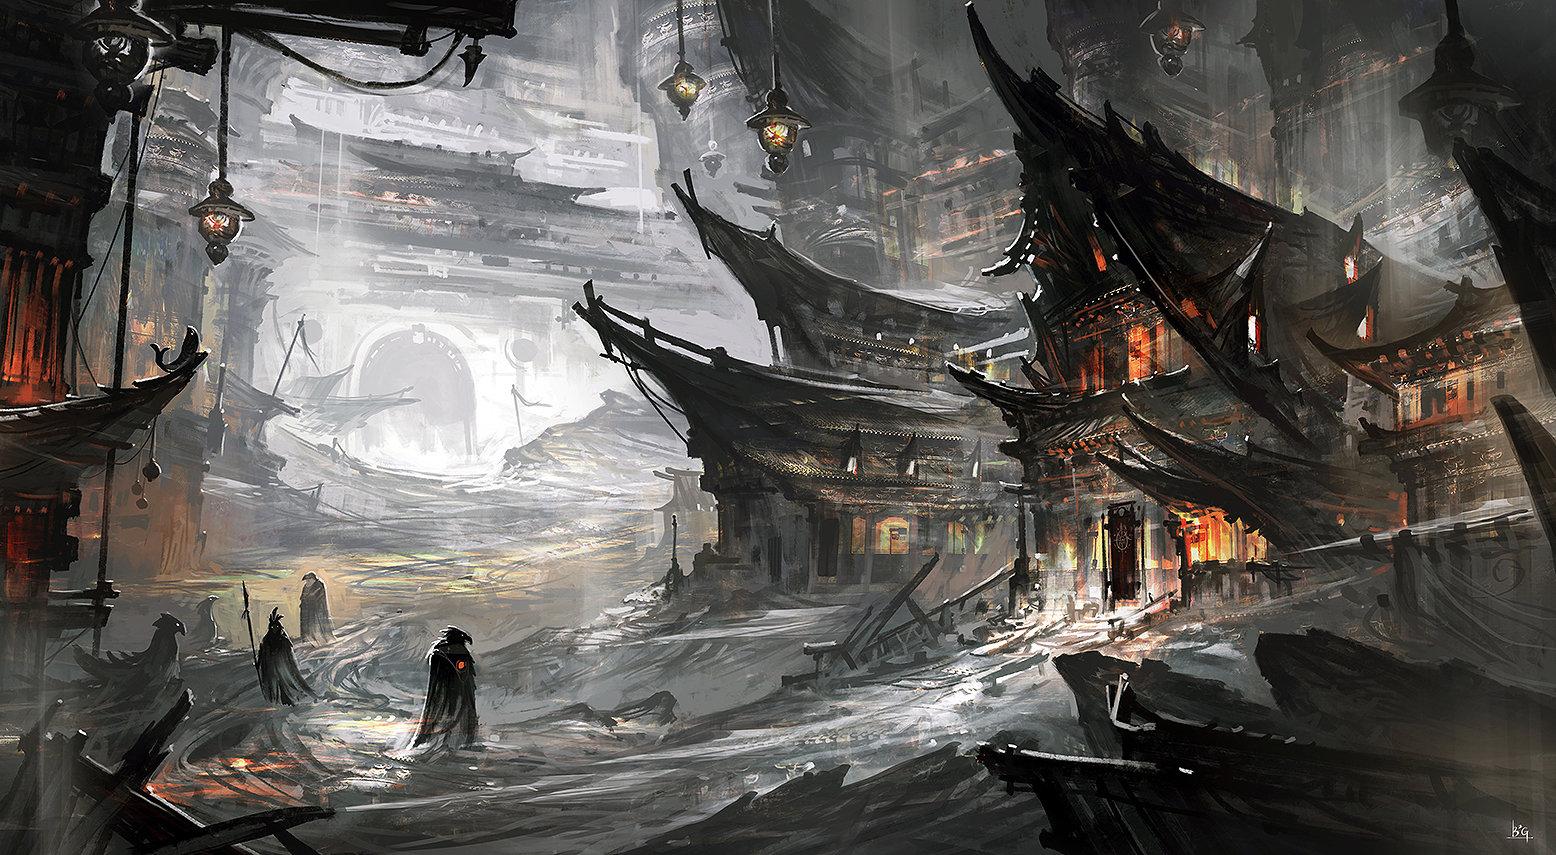 Concept art храма в серых красках, концепт арт от gao-zhingping